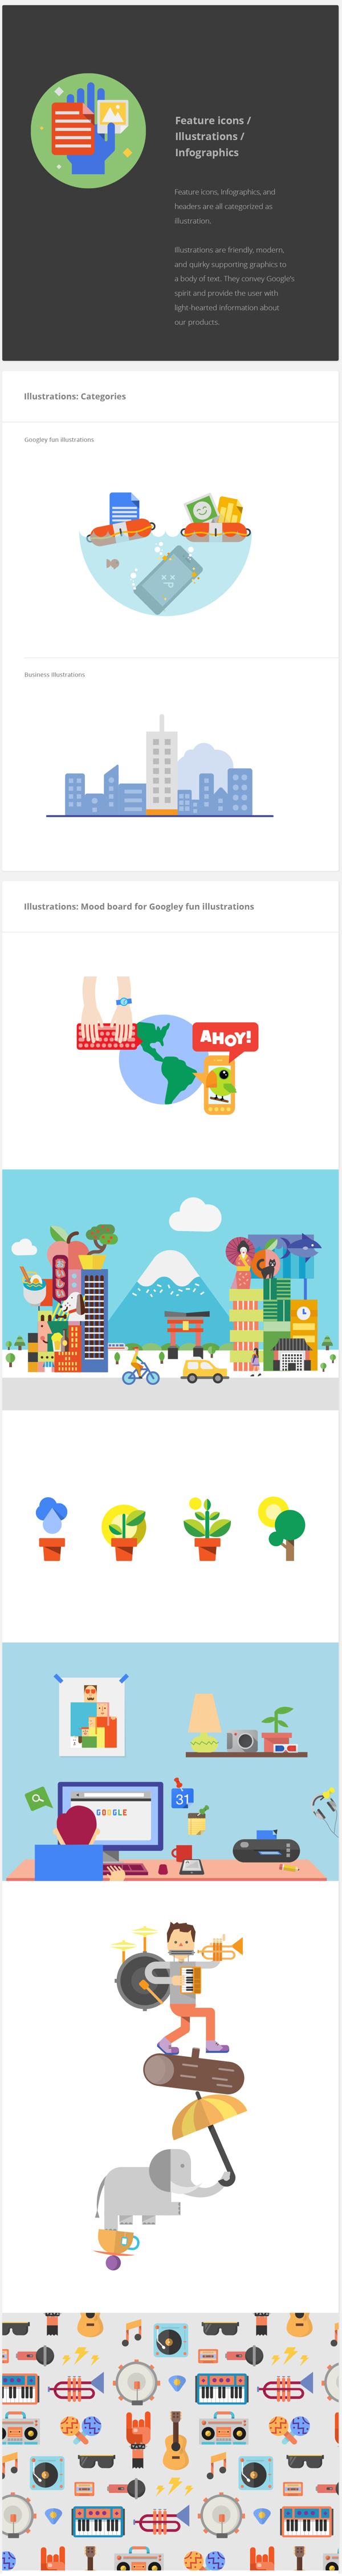 Google Visual Assets Guidelines | Illustrations